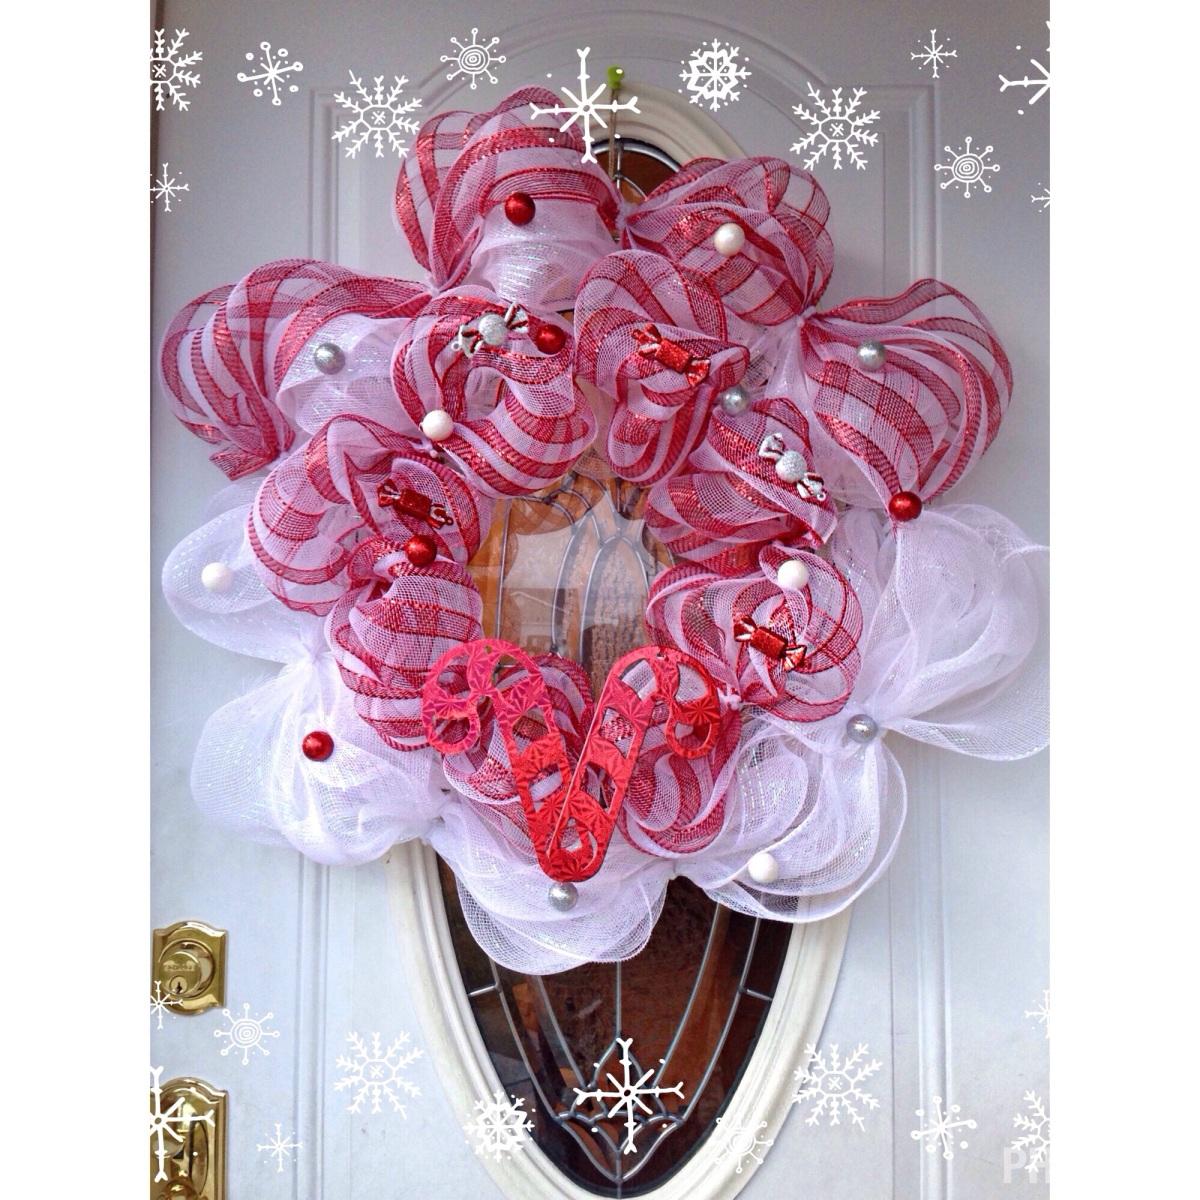 Diy Candy Land Christmas Wreath Using Deco Mesh A Modest